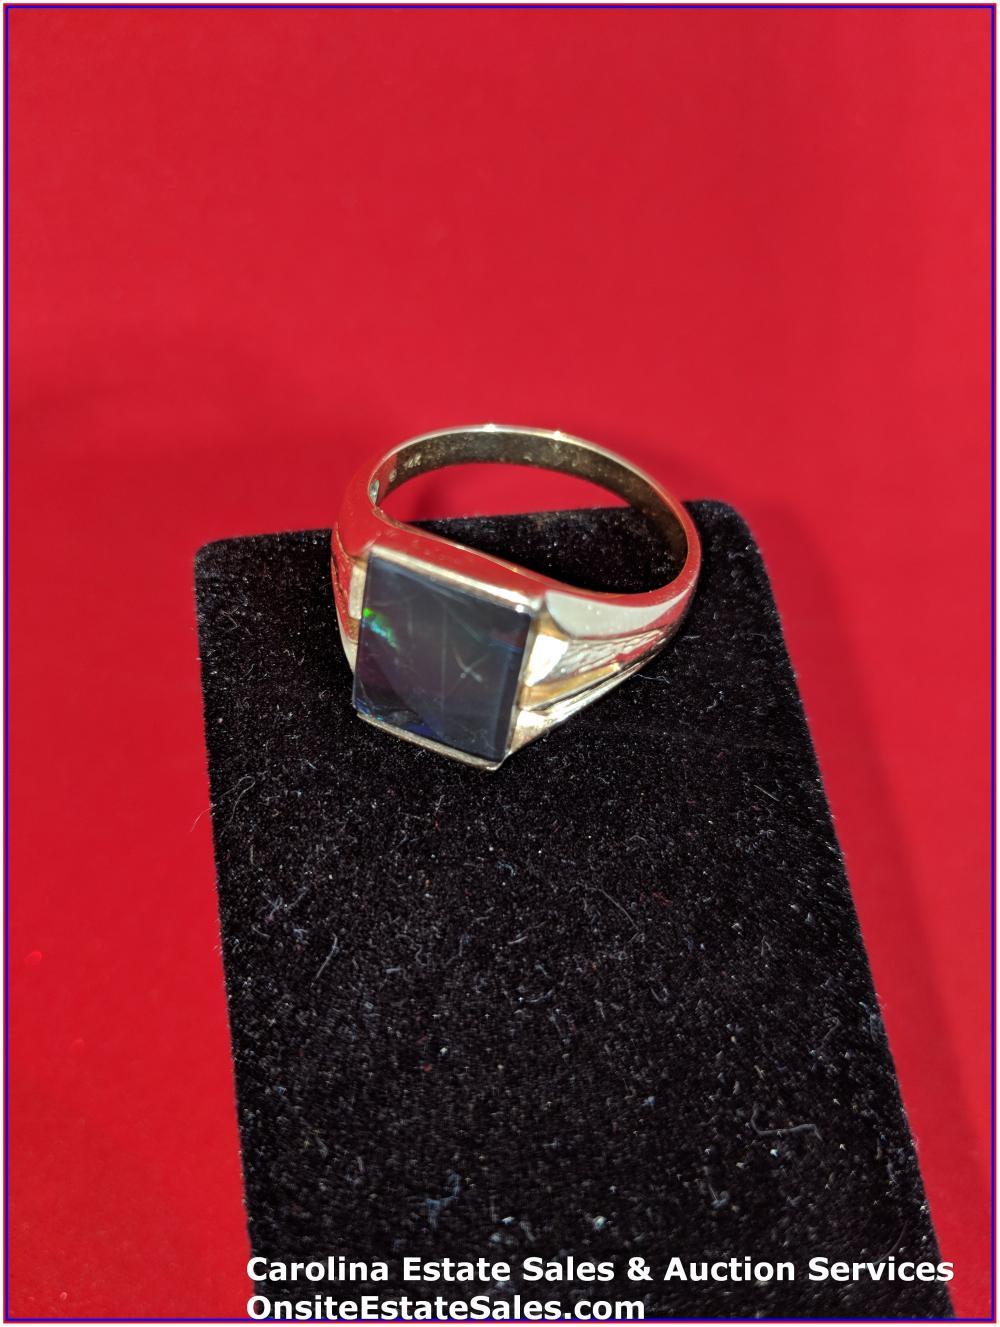 14K Gem Ring Gold 8 Grams Total Weight; Ammolite Center Stone